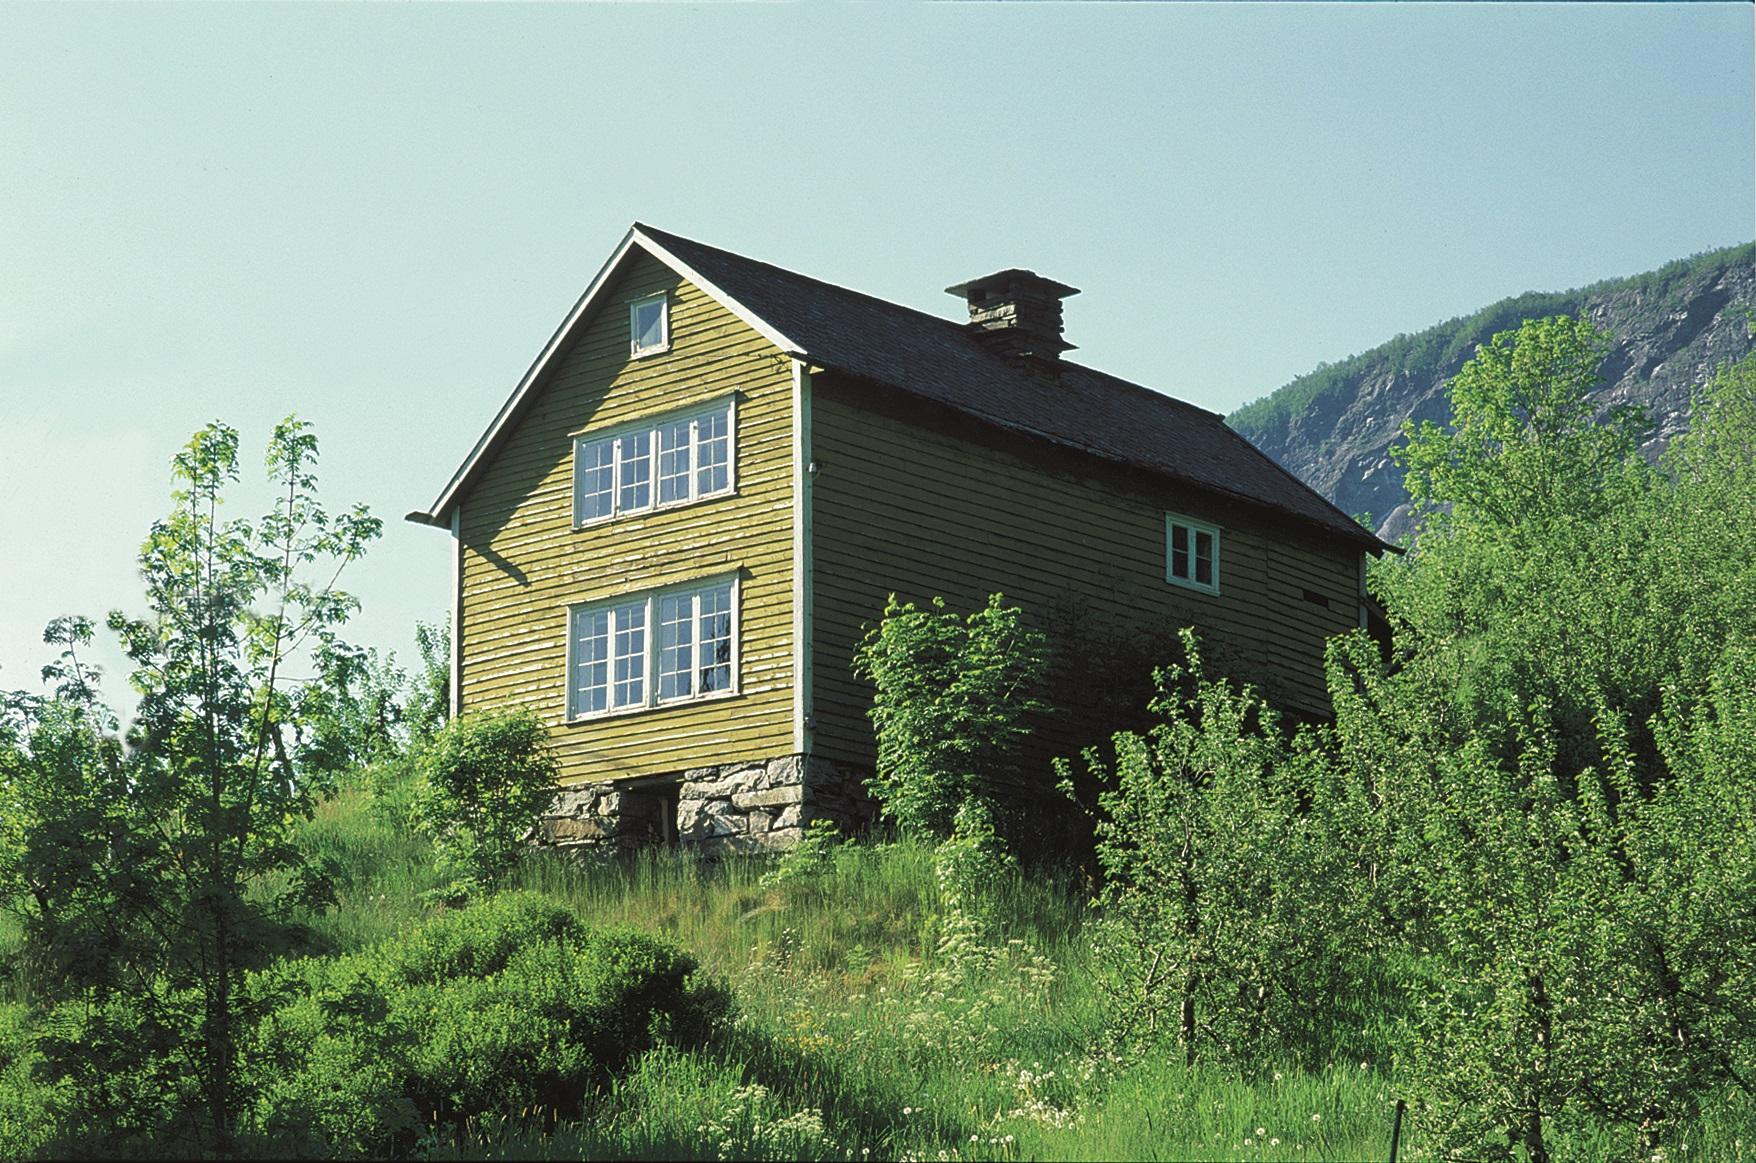 Brynjelstova at Storegraven